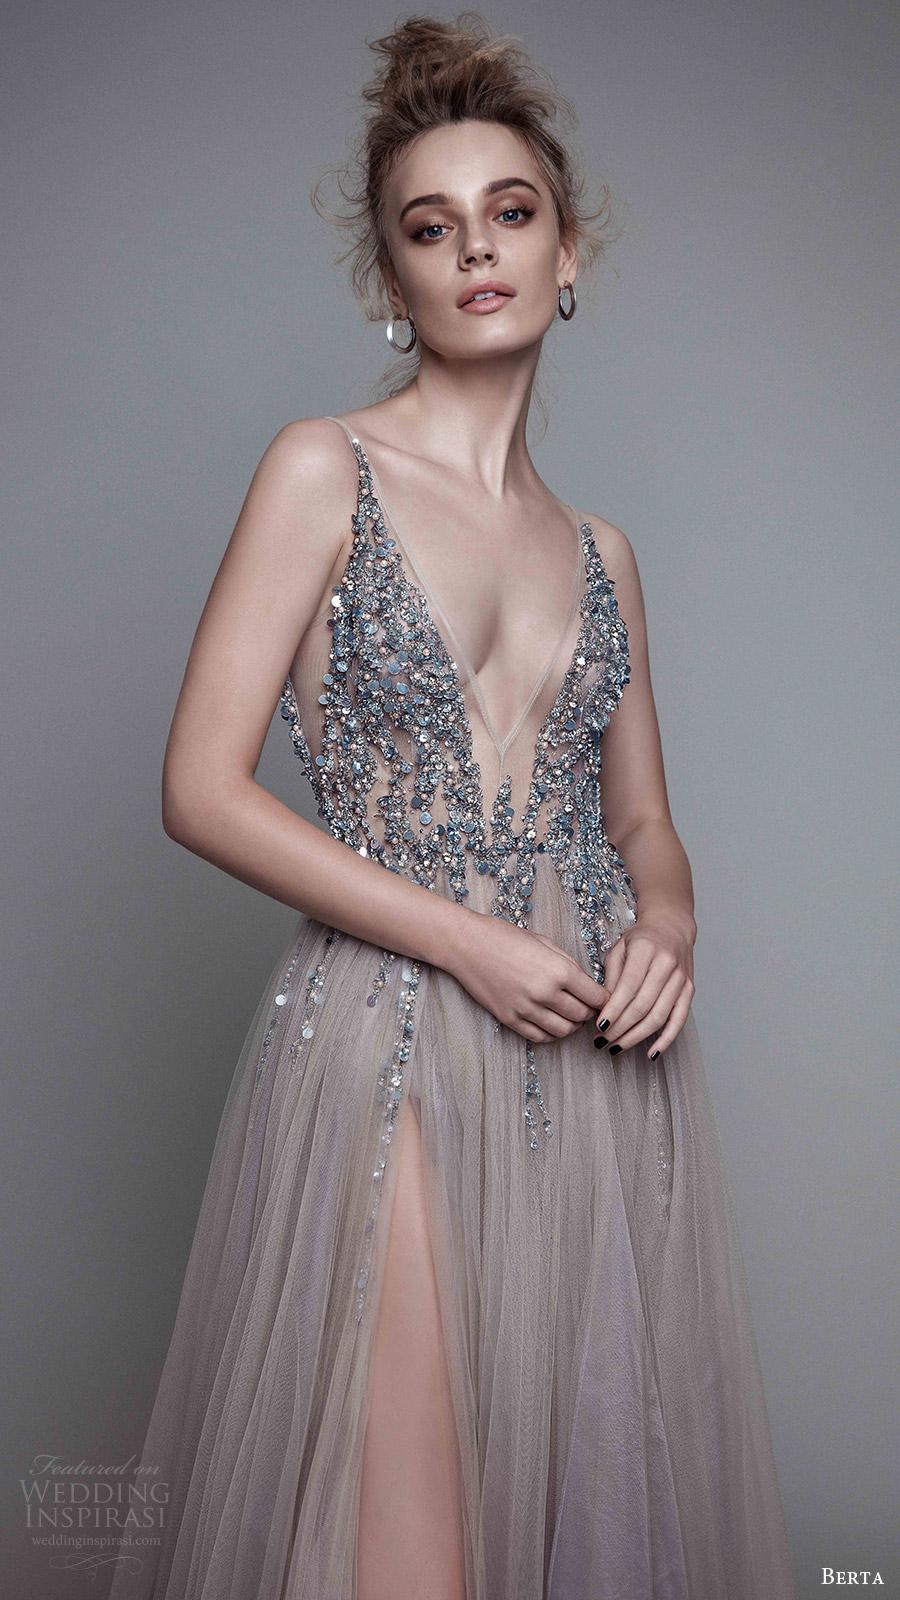 berta rtw fall 2017 (17 11) sleeveless deep v neck a line beaded bodice evening wedding dress slit skirt zfv